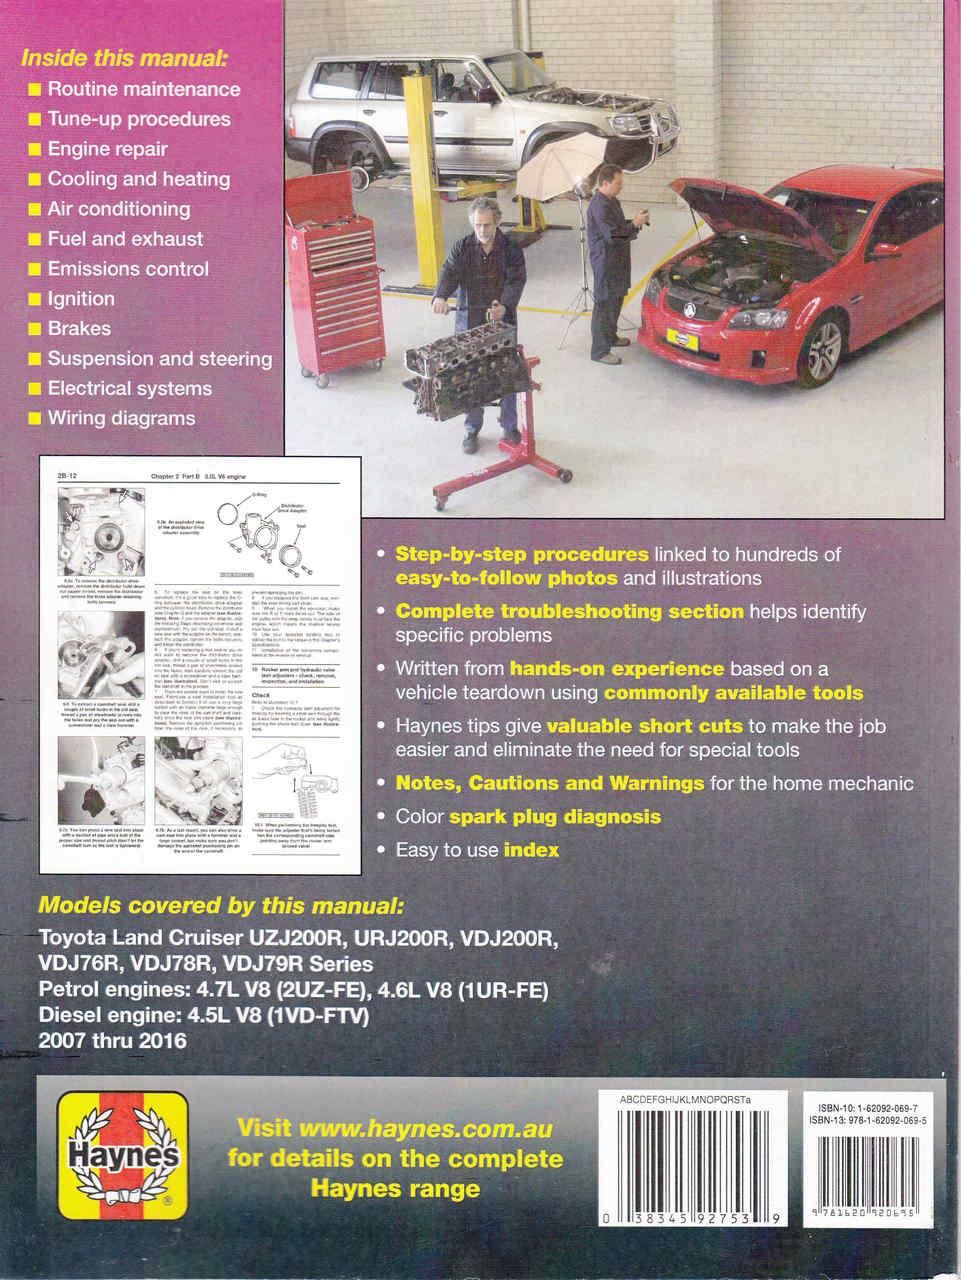 1997 cr80 service manual